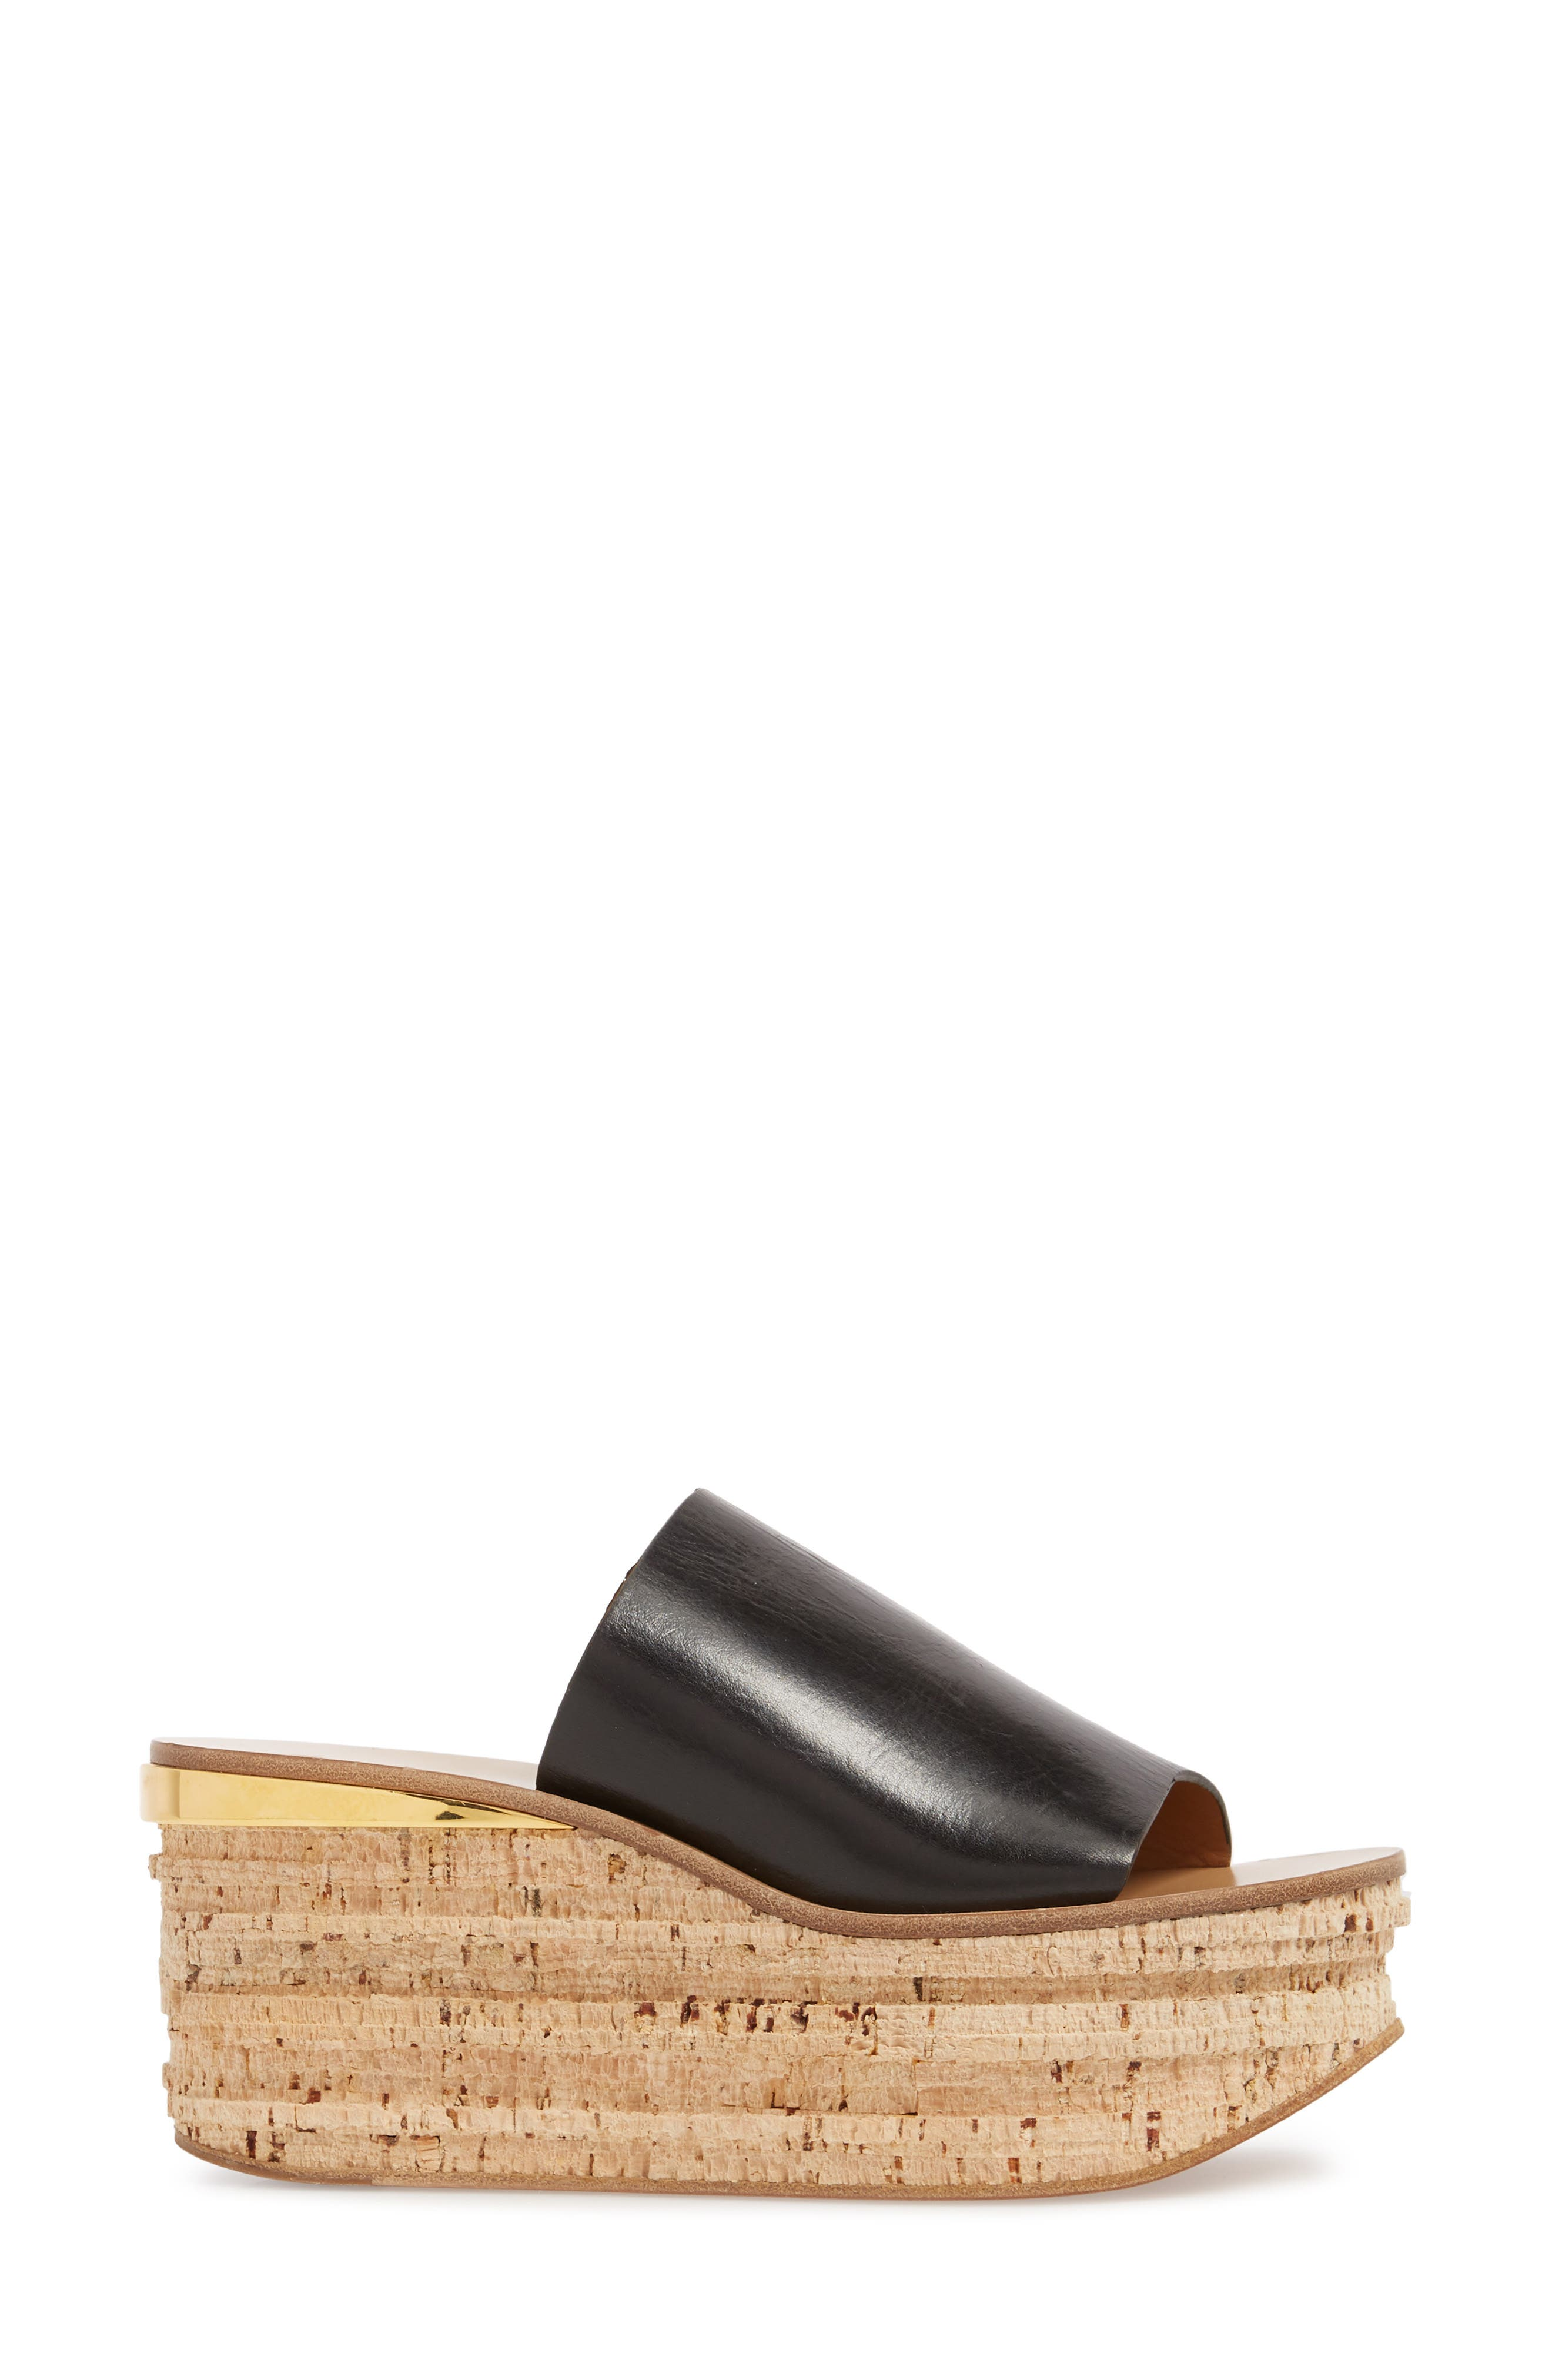 CHLOÉ, Camille Cork Platform Sandal, Alternate thumbnail 3, color, BLACK